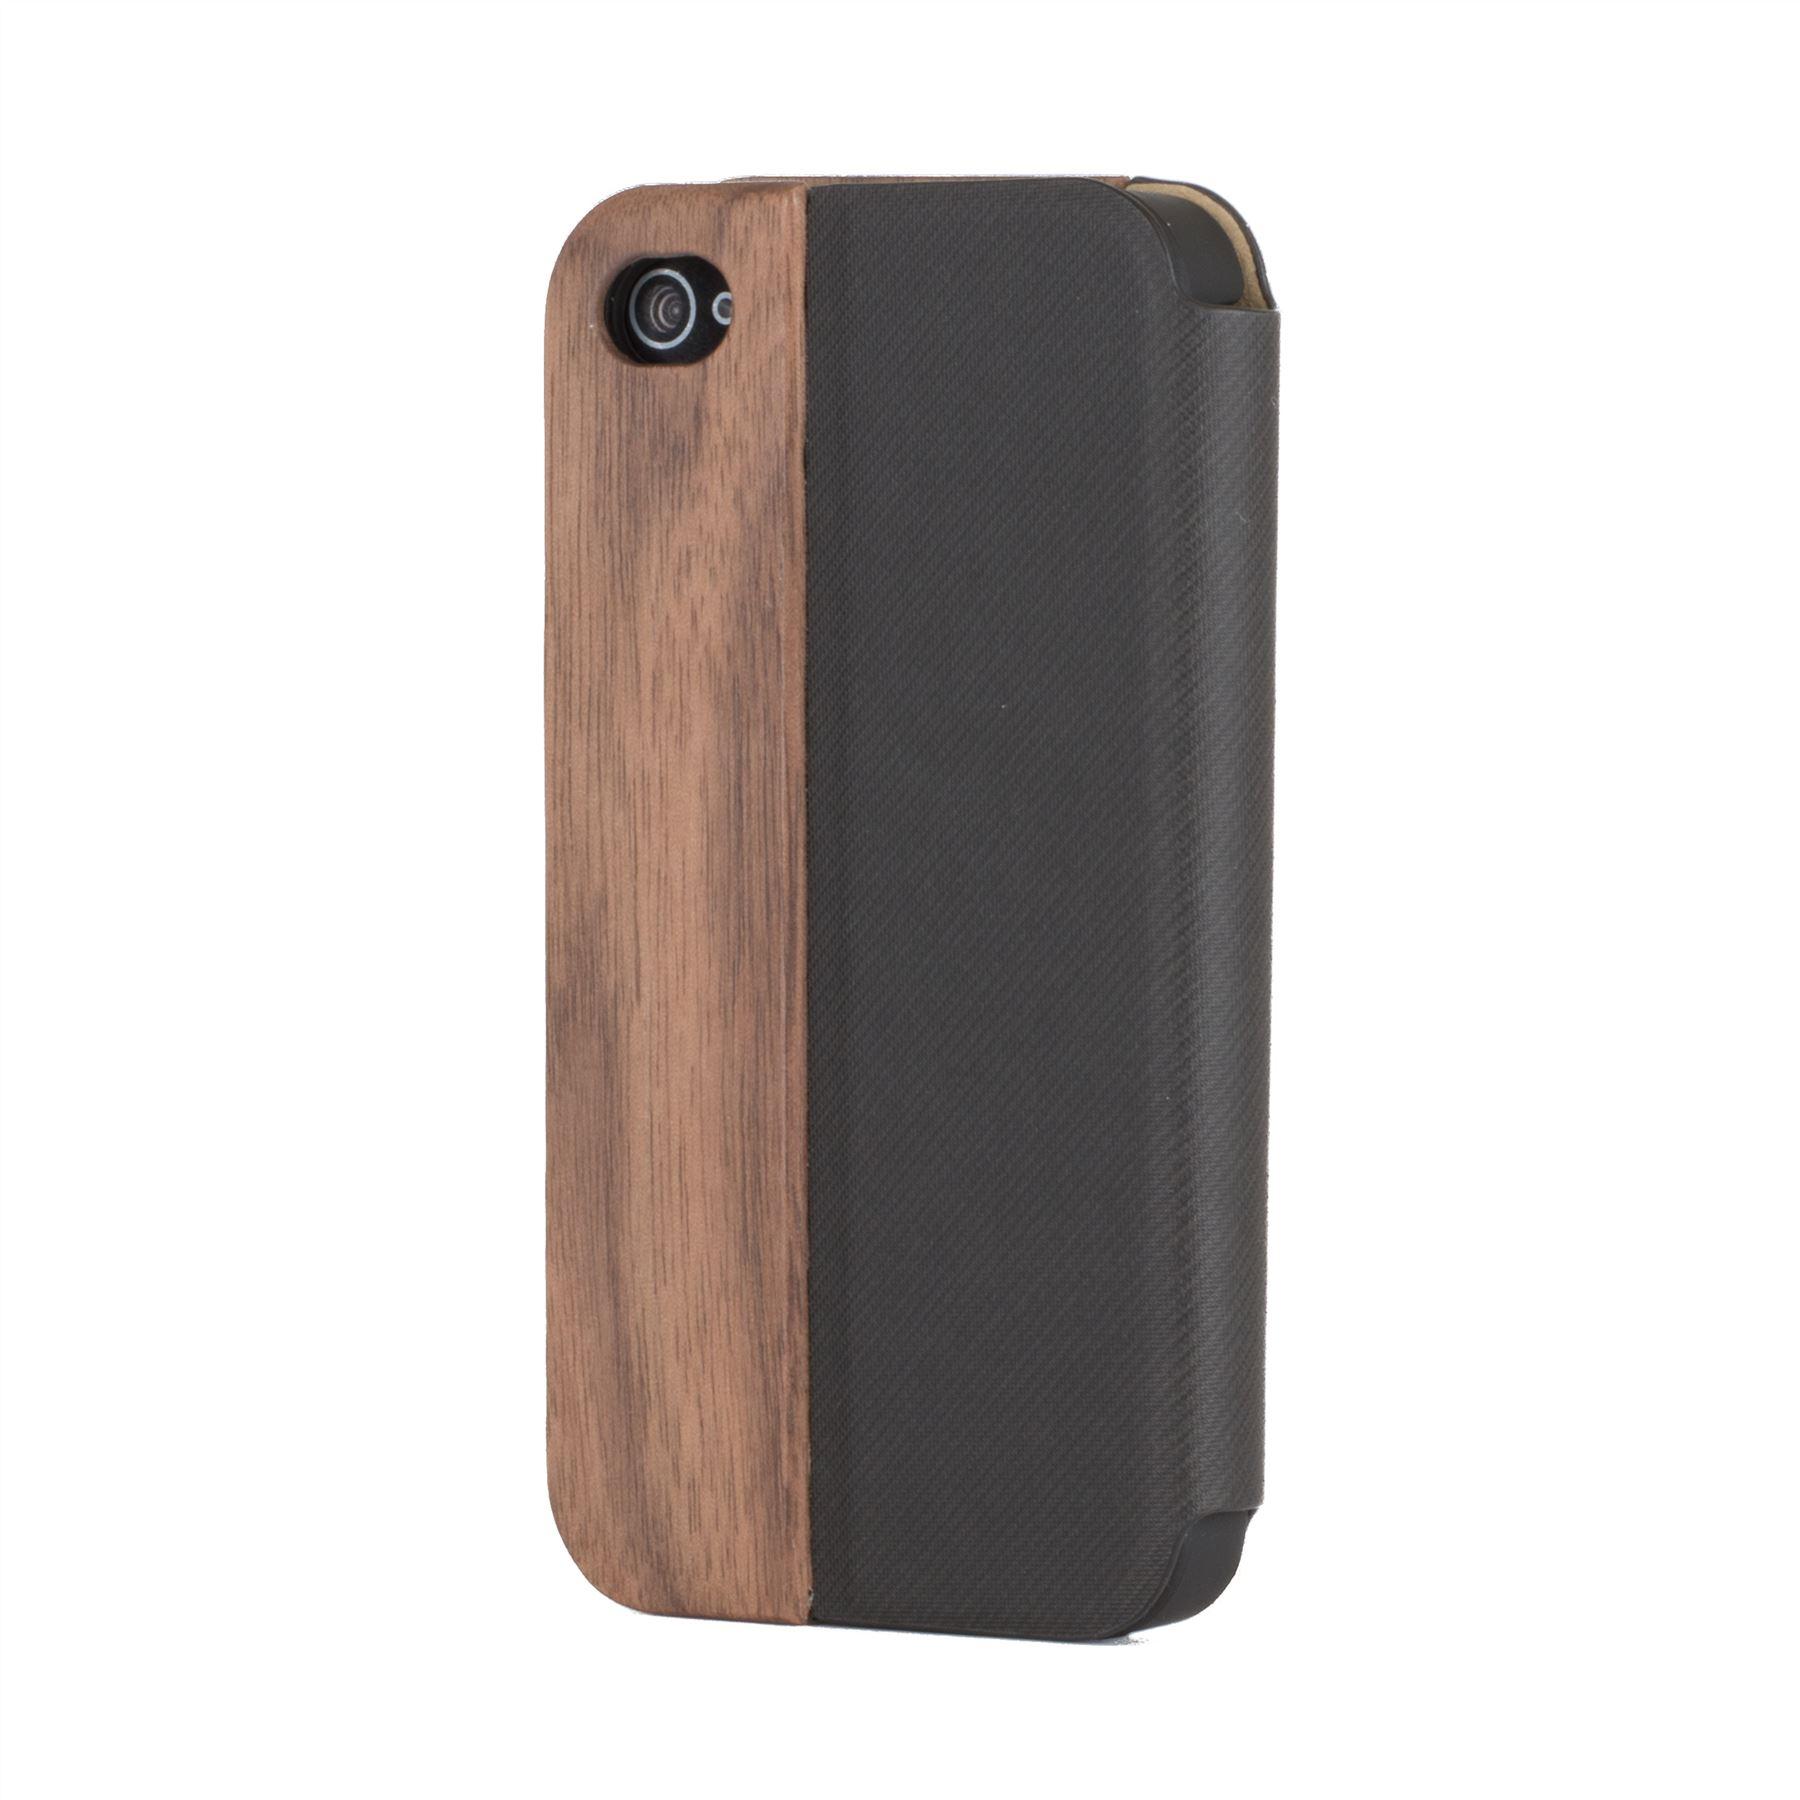 snakehive apple iphone 4 4s real wood leather wallet flip case cover ebay. Black Bedroom Furniture Sets. Home Design Ideas